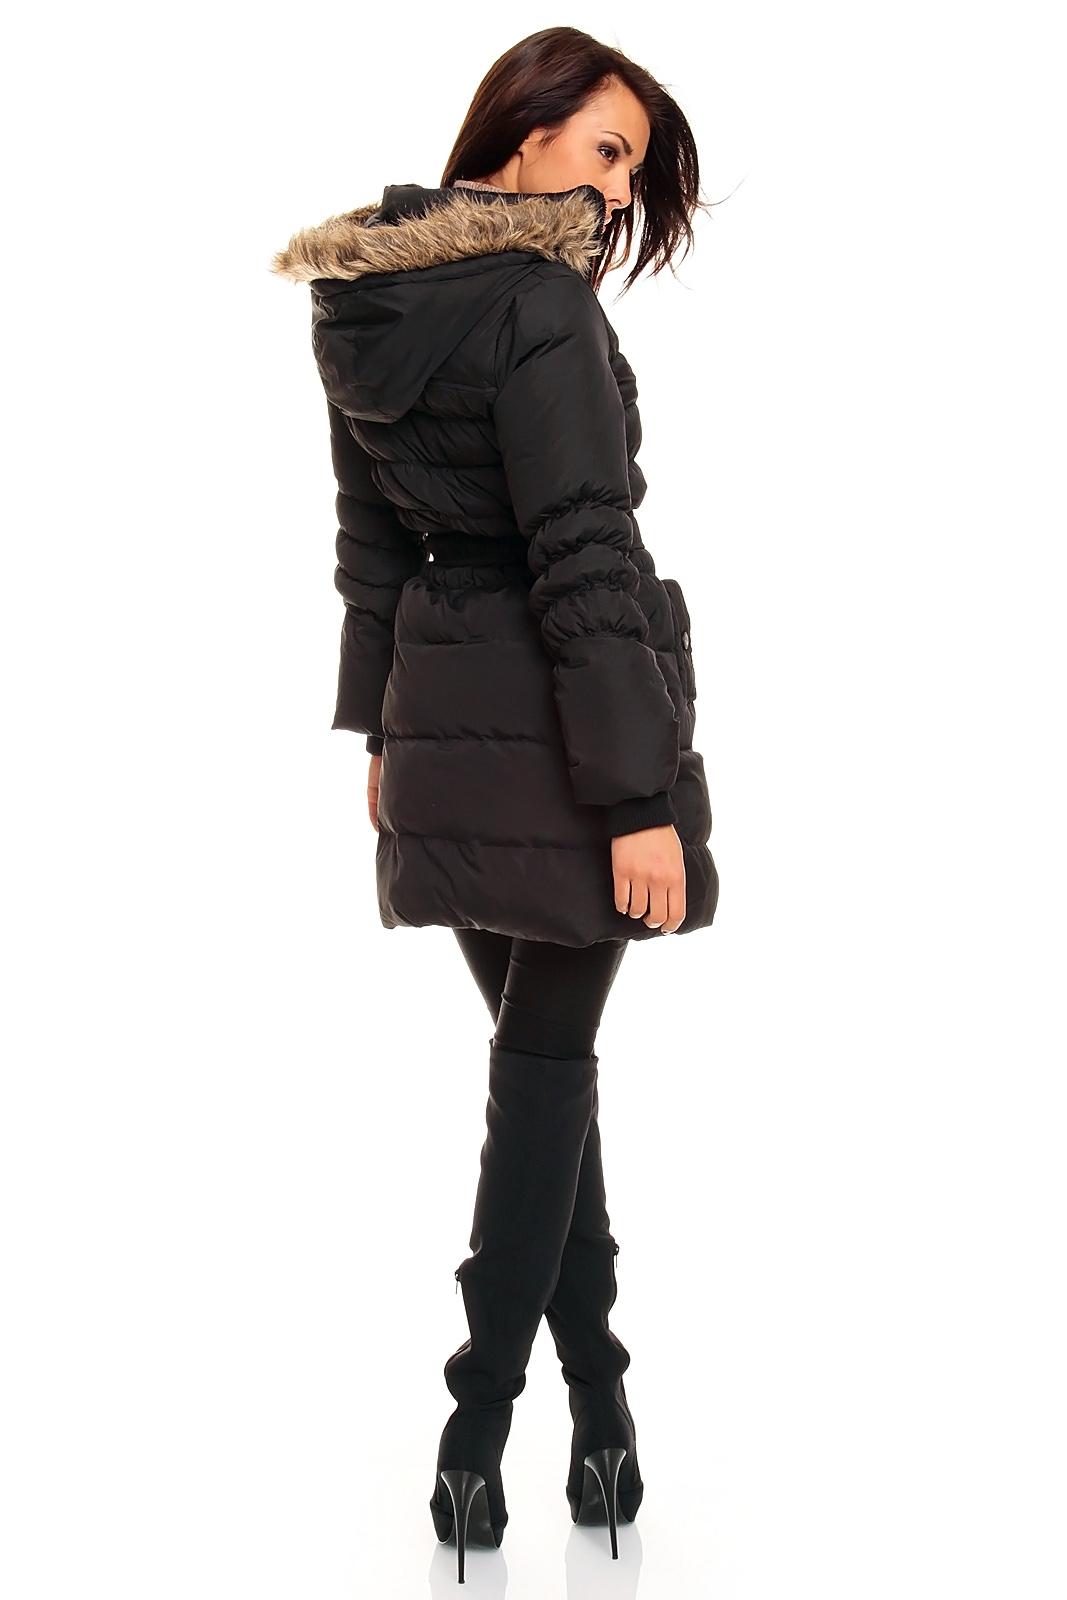 fresh made daunen steppmantel mantel wintermantel jacke mit kapuze sw ebay. Black Bedroom Furniture Sets. Home Design Ideas